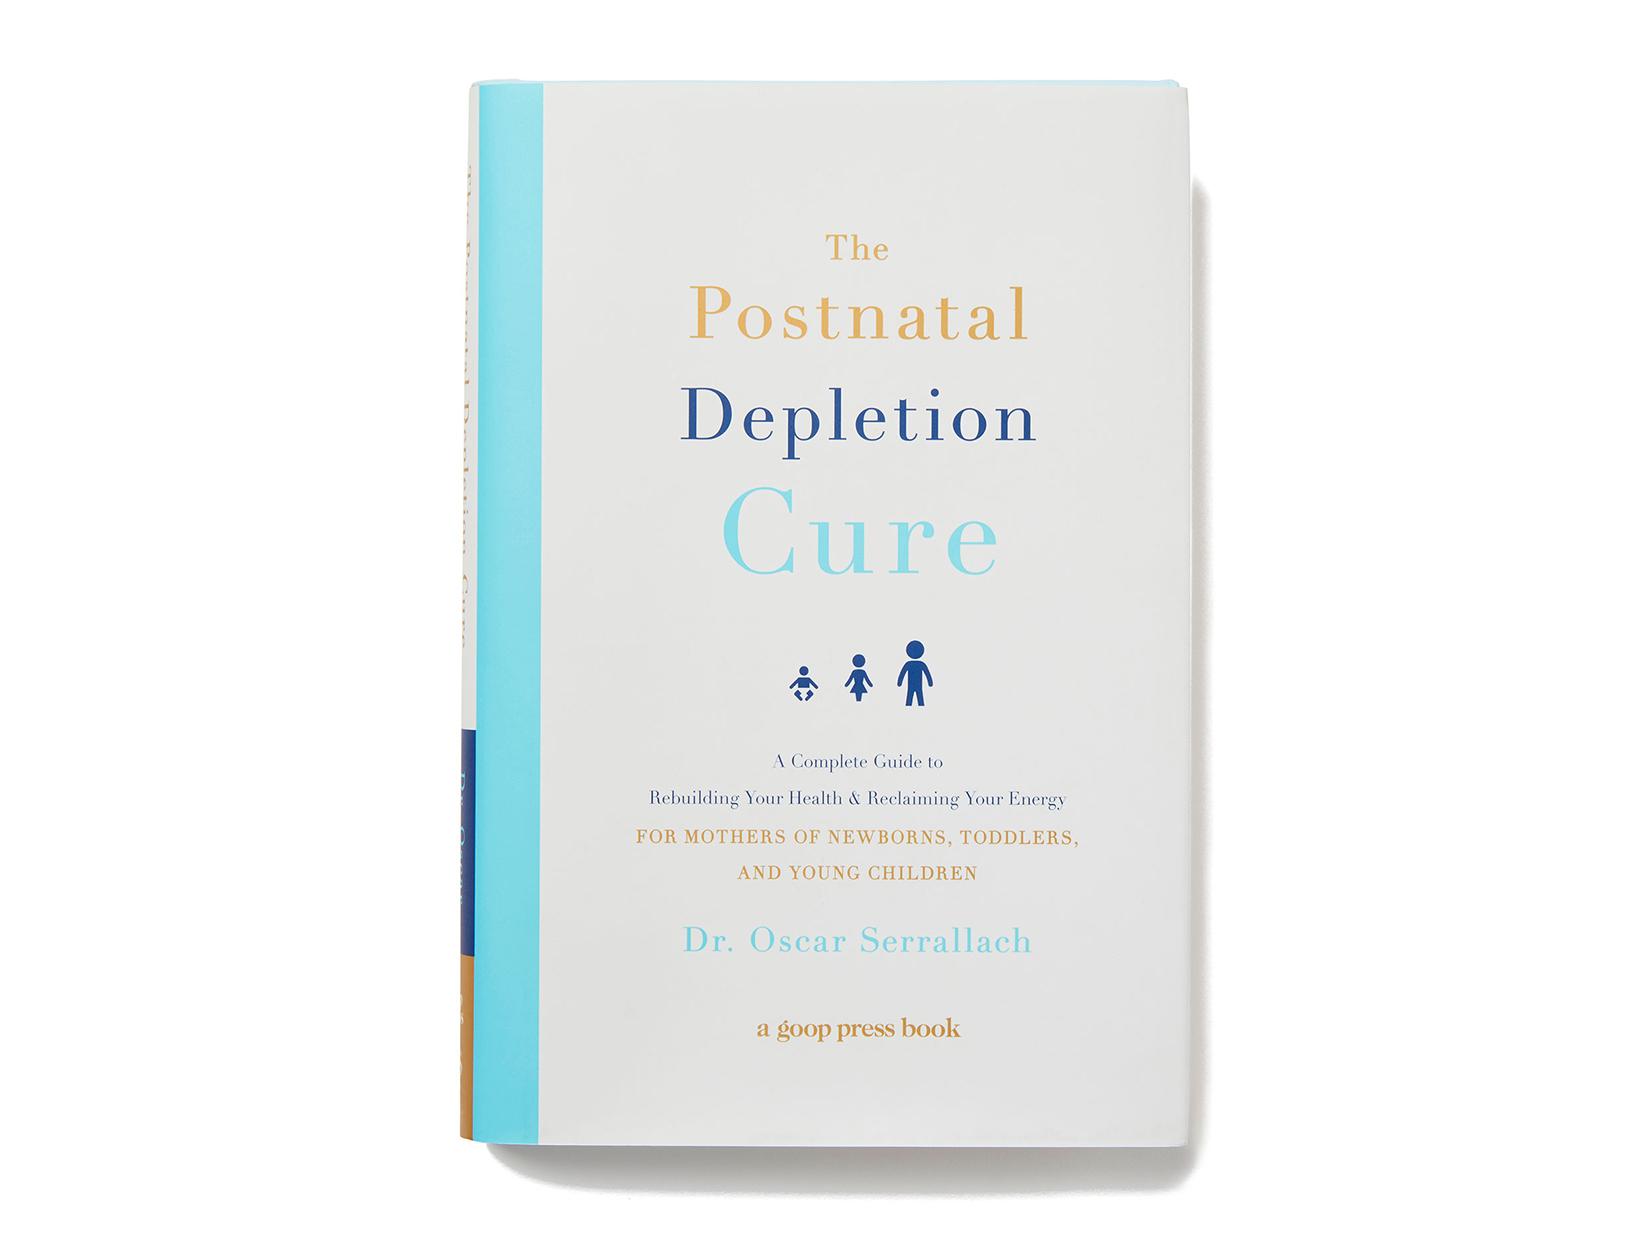 <em>The Postnatal Depletion Cure</em> by Dr. Oscar Serrallach